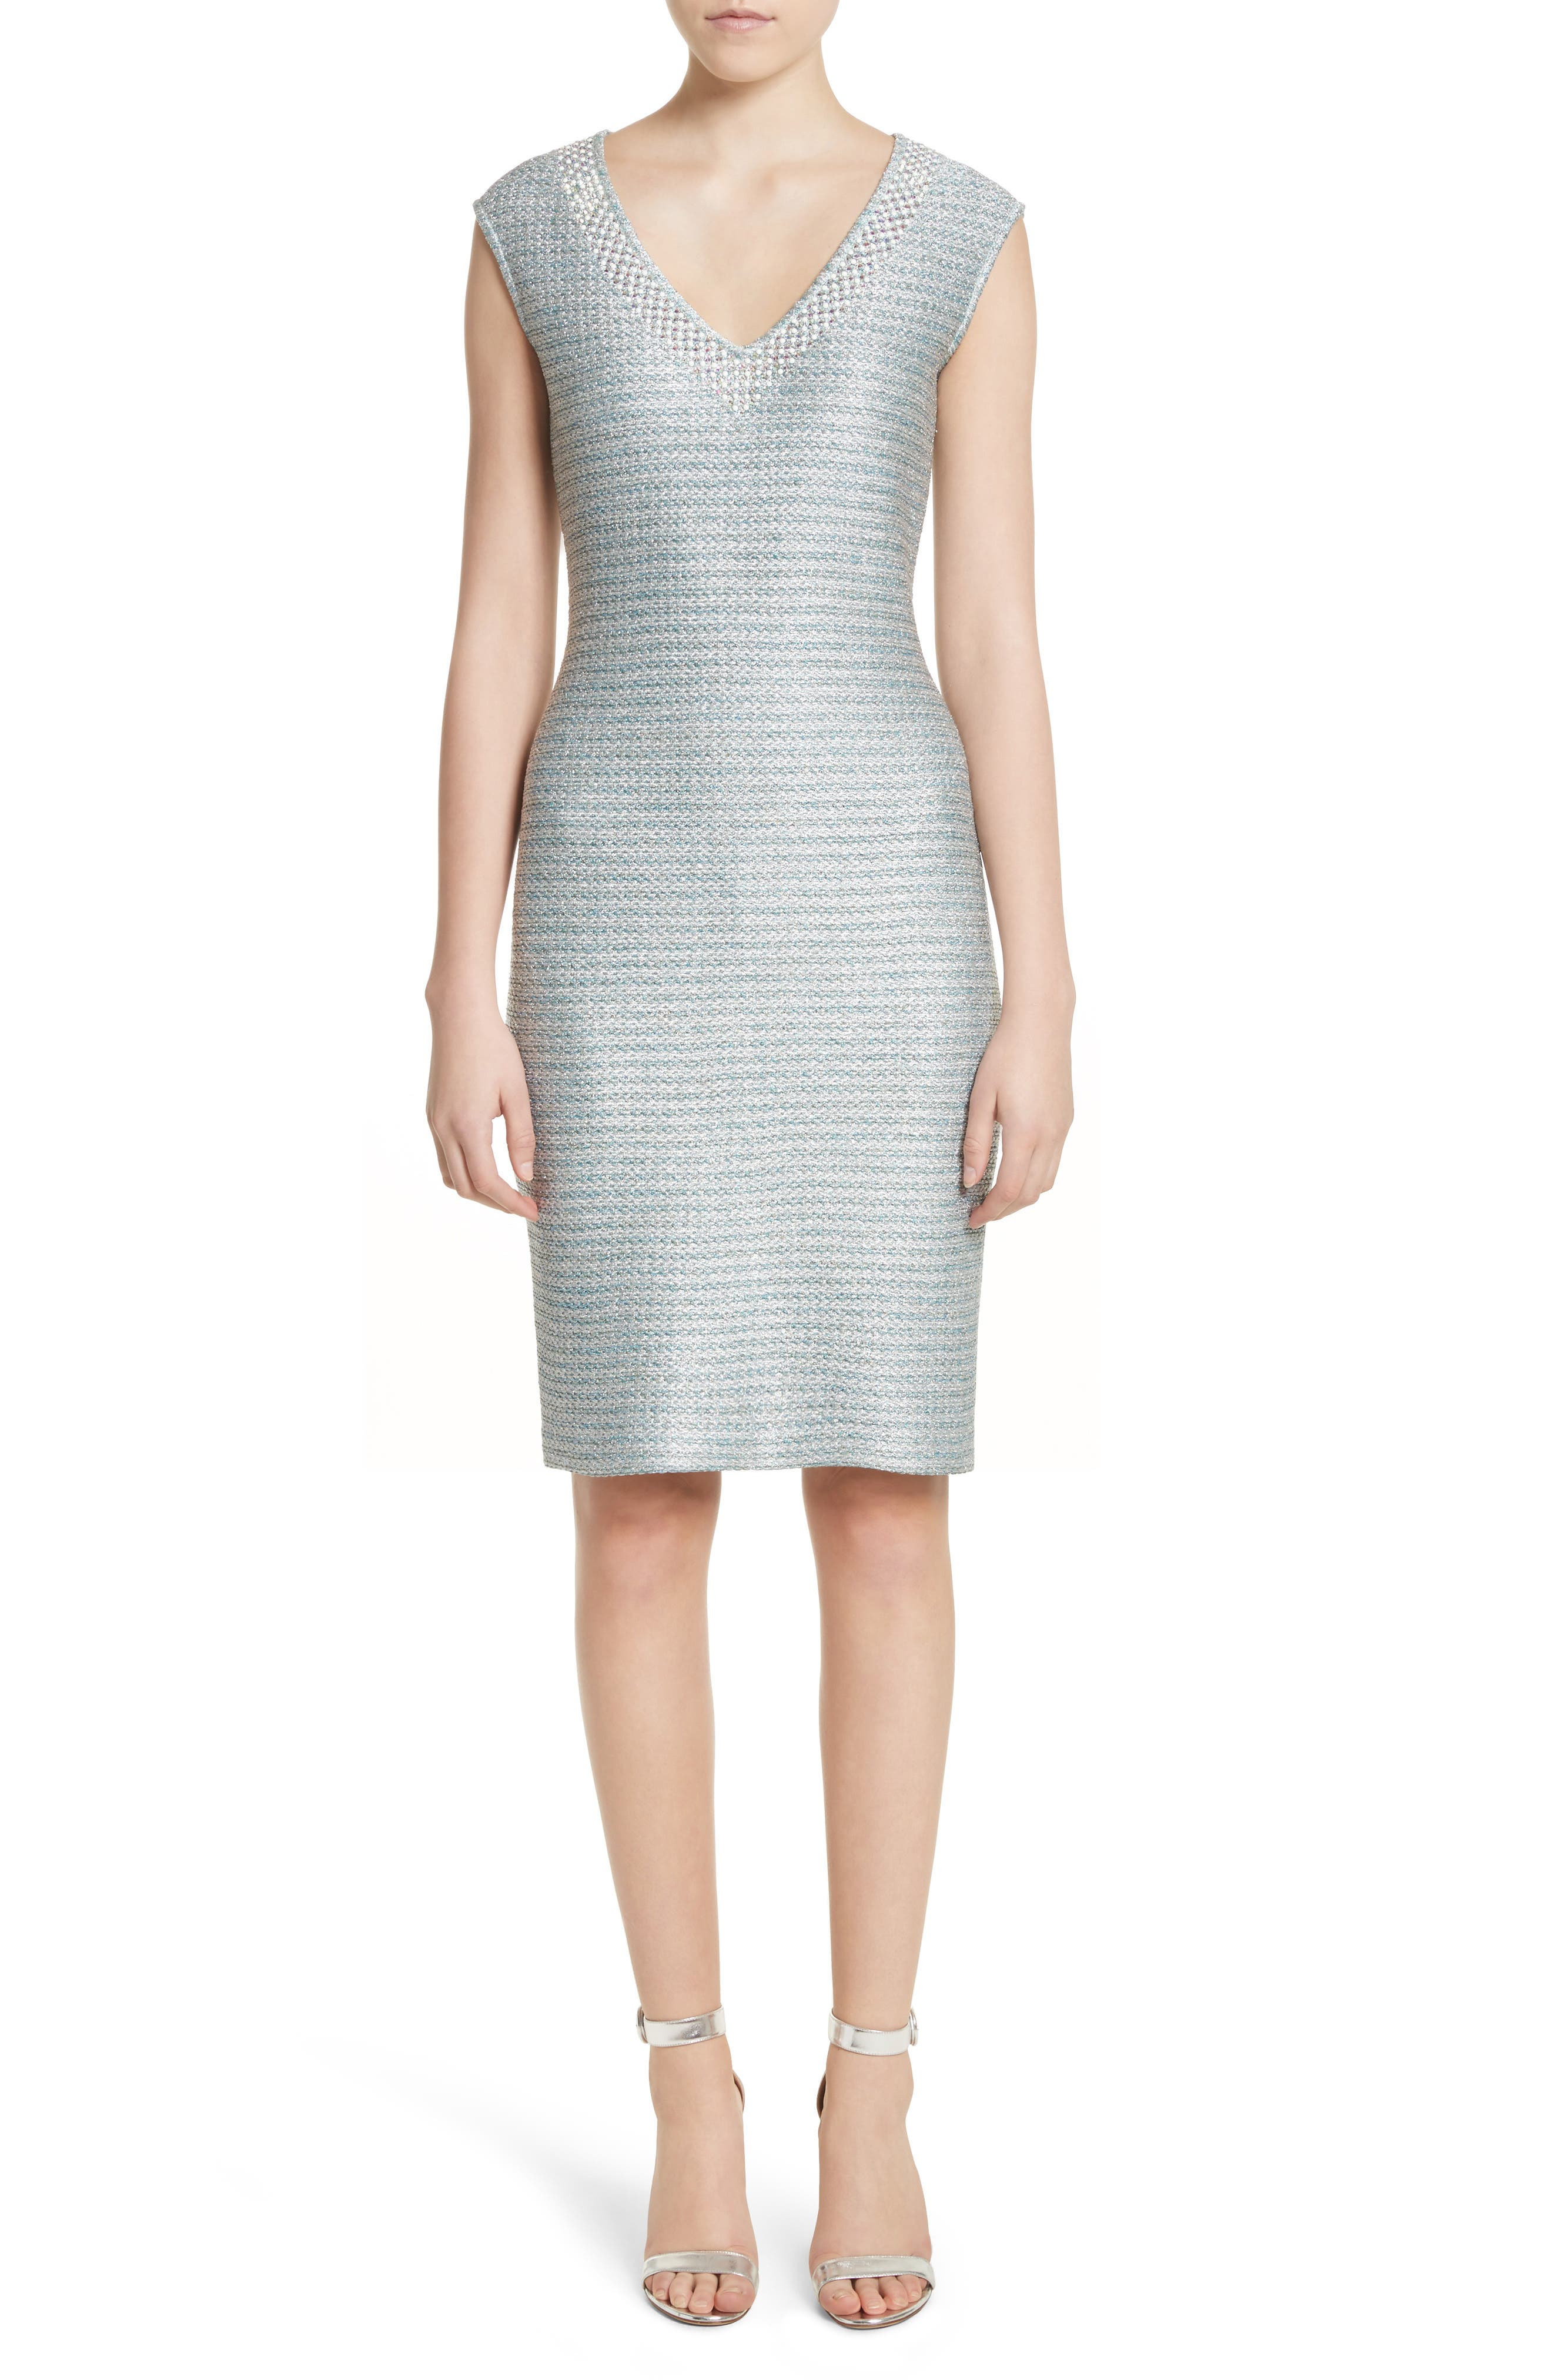 Main Image - St. John Collection Gleam Metallic Knit Sheath Dress